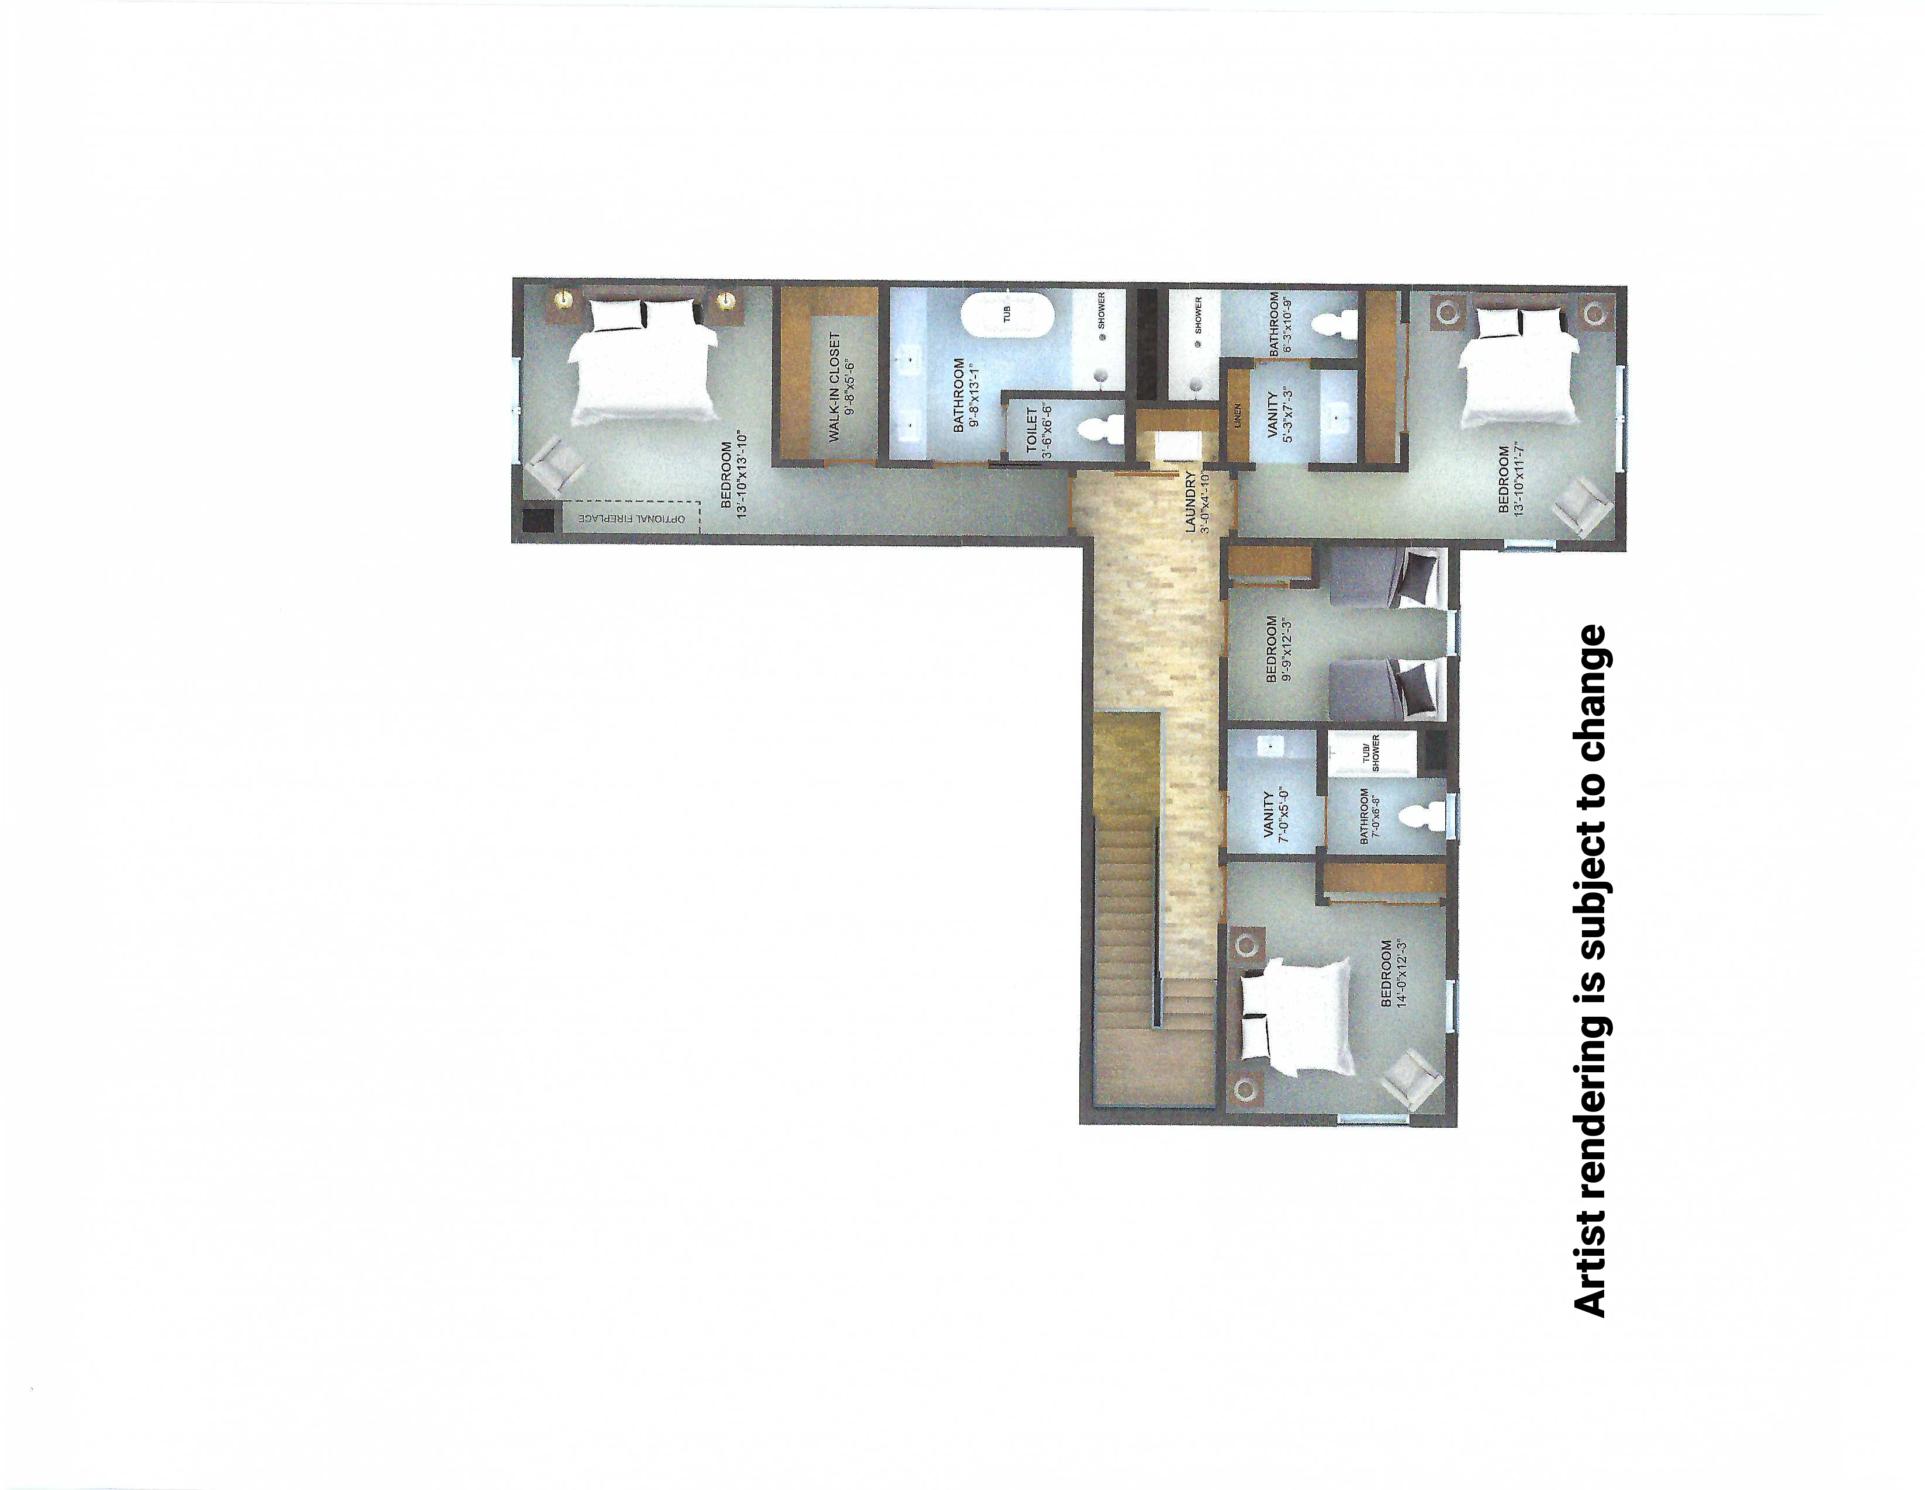 floorplan2wdisclaimer